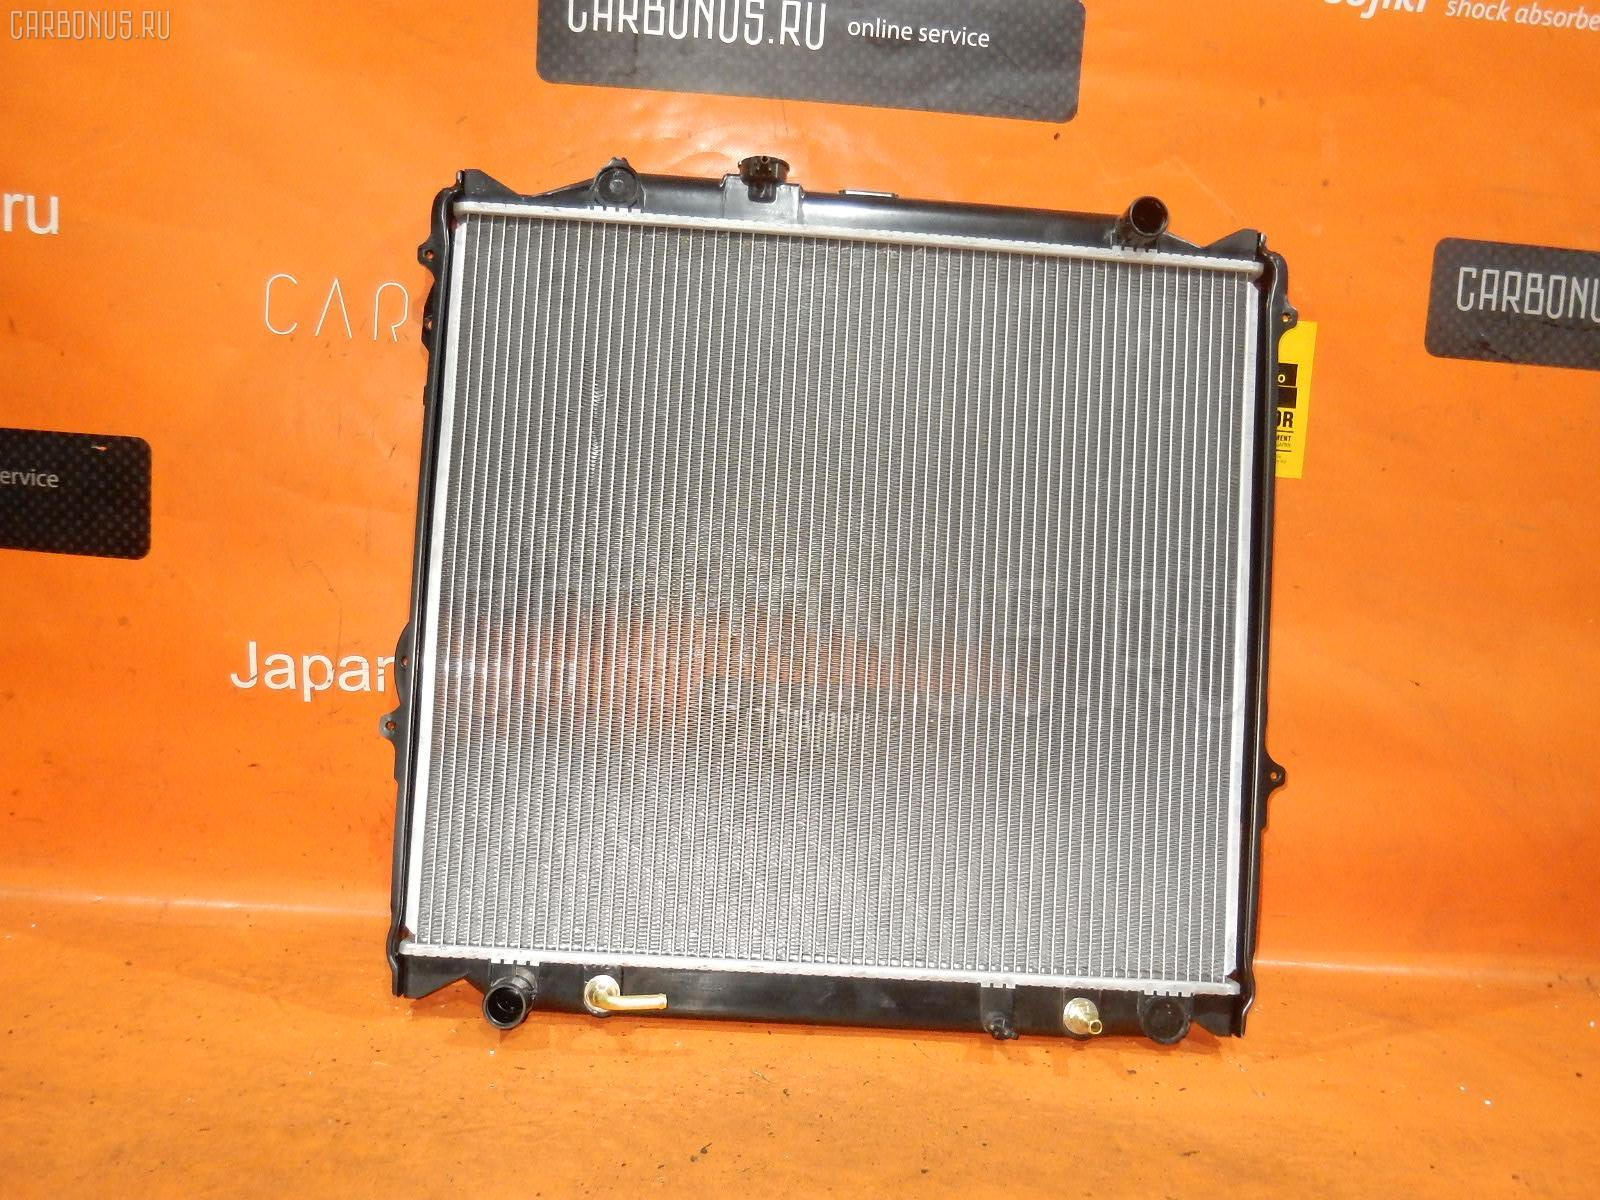 Радиатор ДВС Toyota Land cruiser prado VZJ95W 5VZ-FE Фото 1